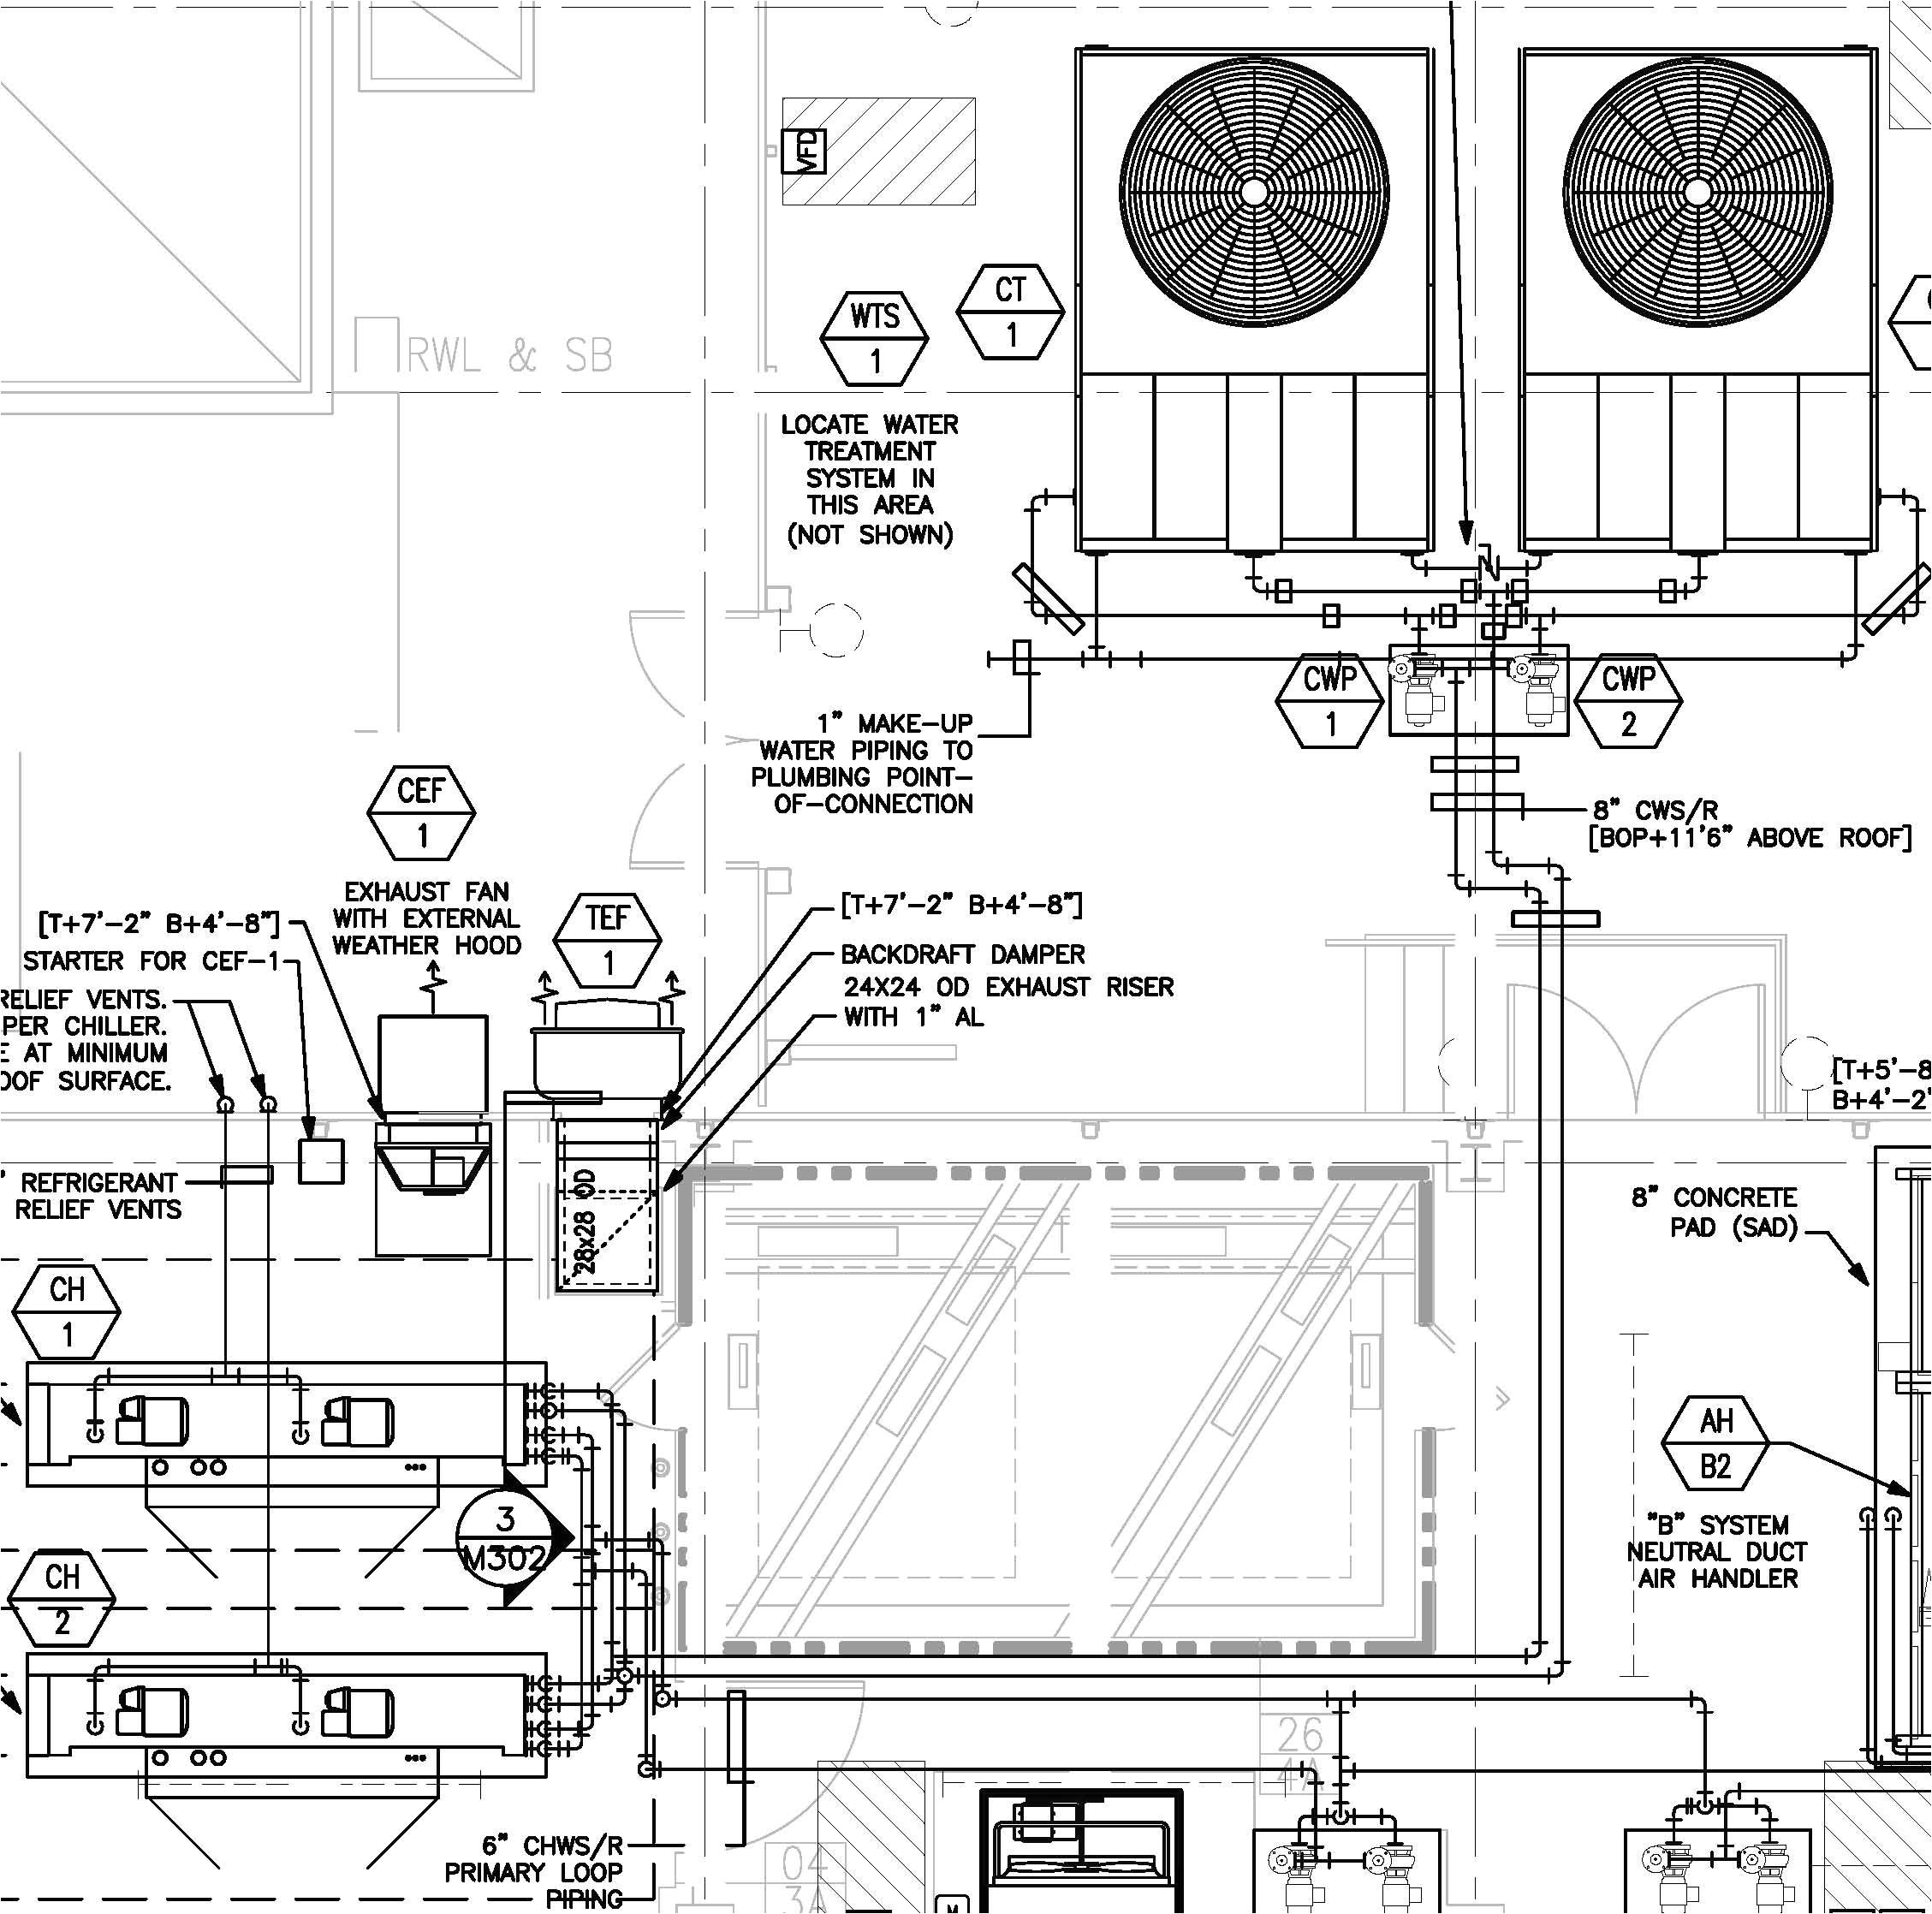 walk in cooler wiring diagram wiring diagram databasenorlake walk in freezer wiring diagram sample